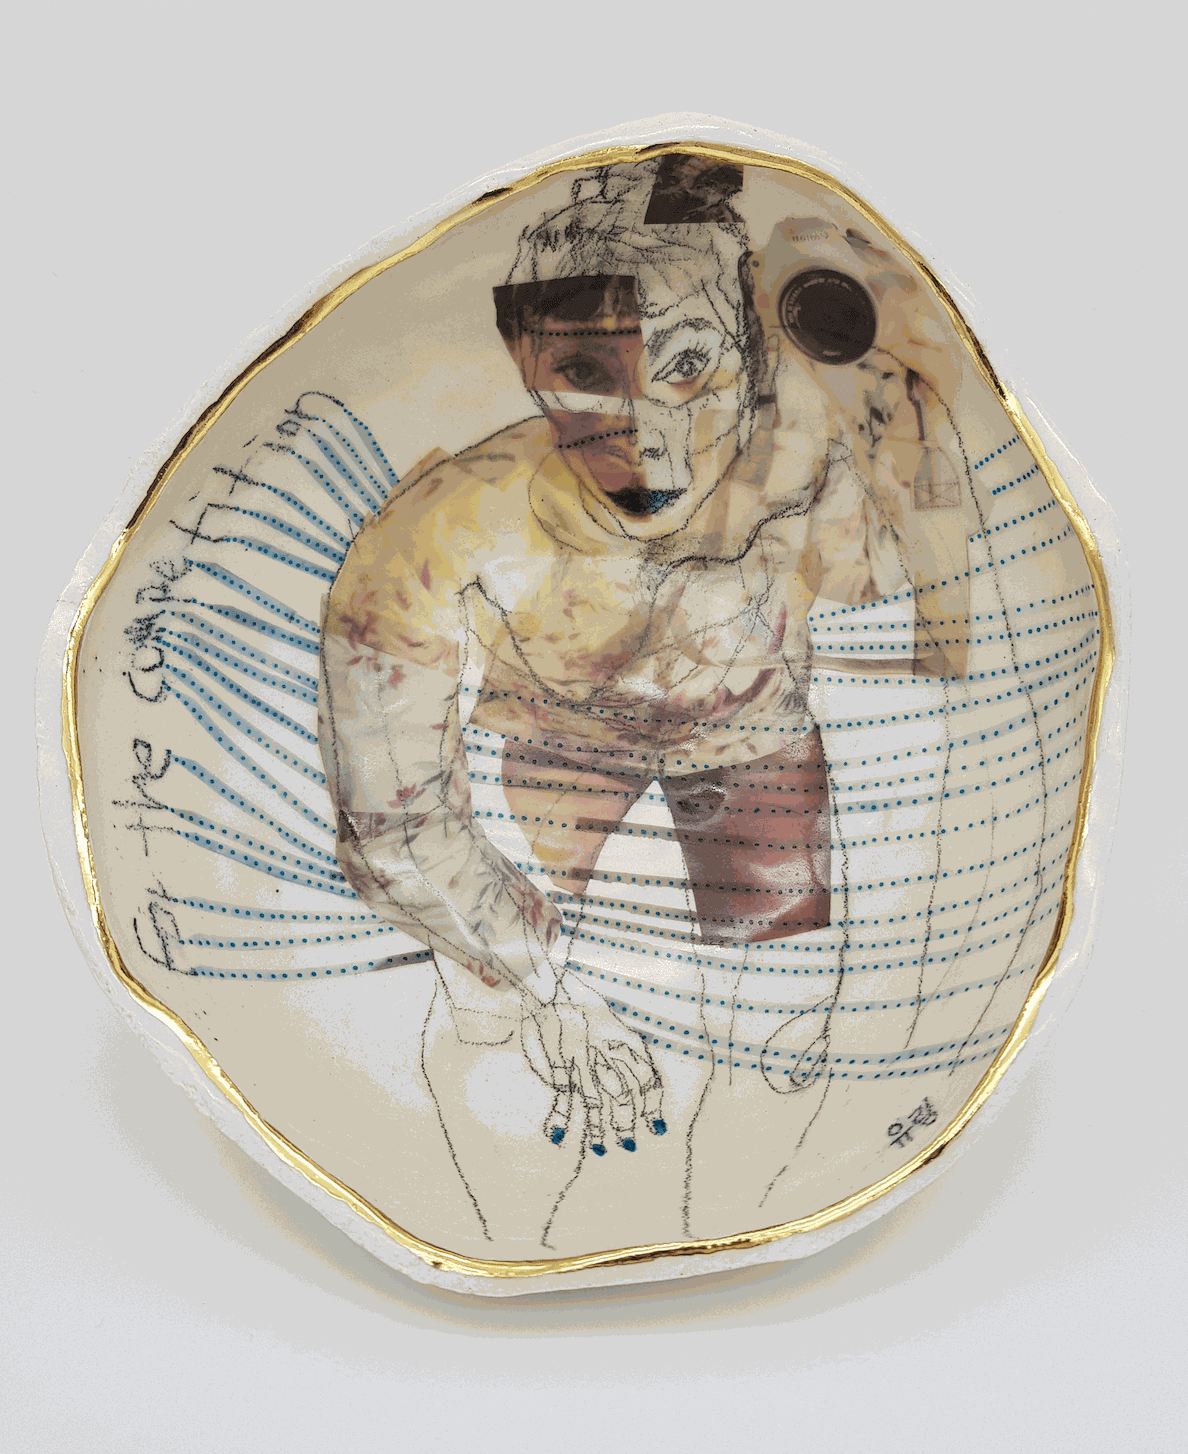 Yurim Gough Yurim & Yurim, 2019 Ceramic pencil on ceramic 24 x 23 x 11.5cm £3,000